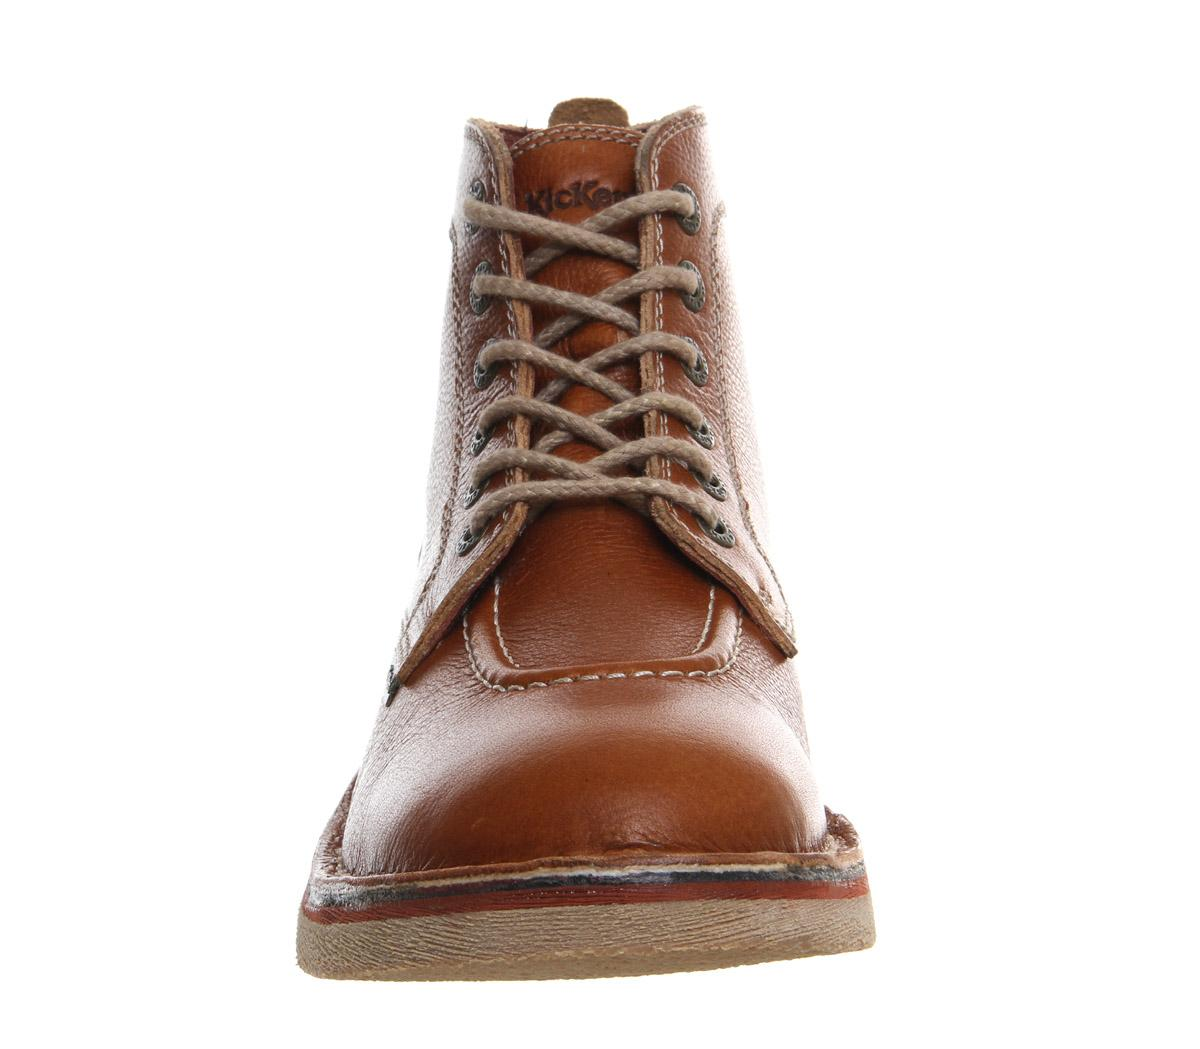 Black kicker sandals - Gallery